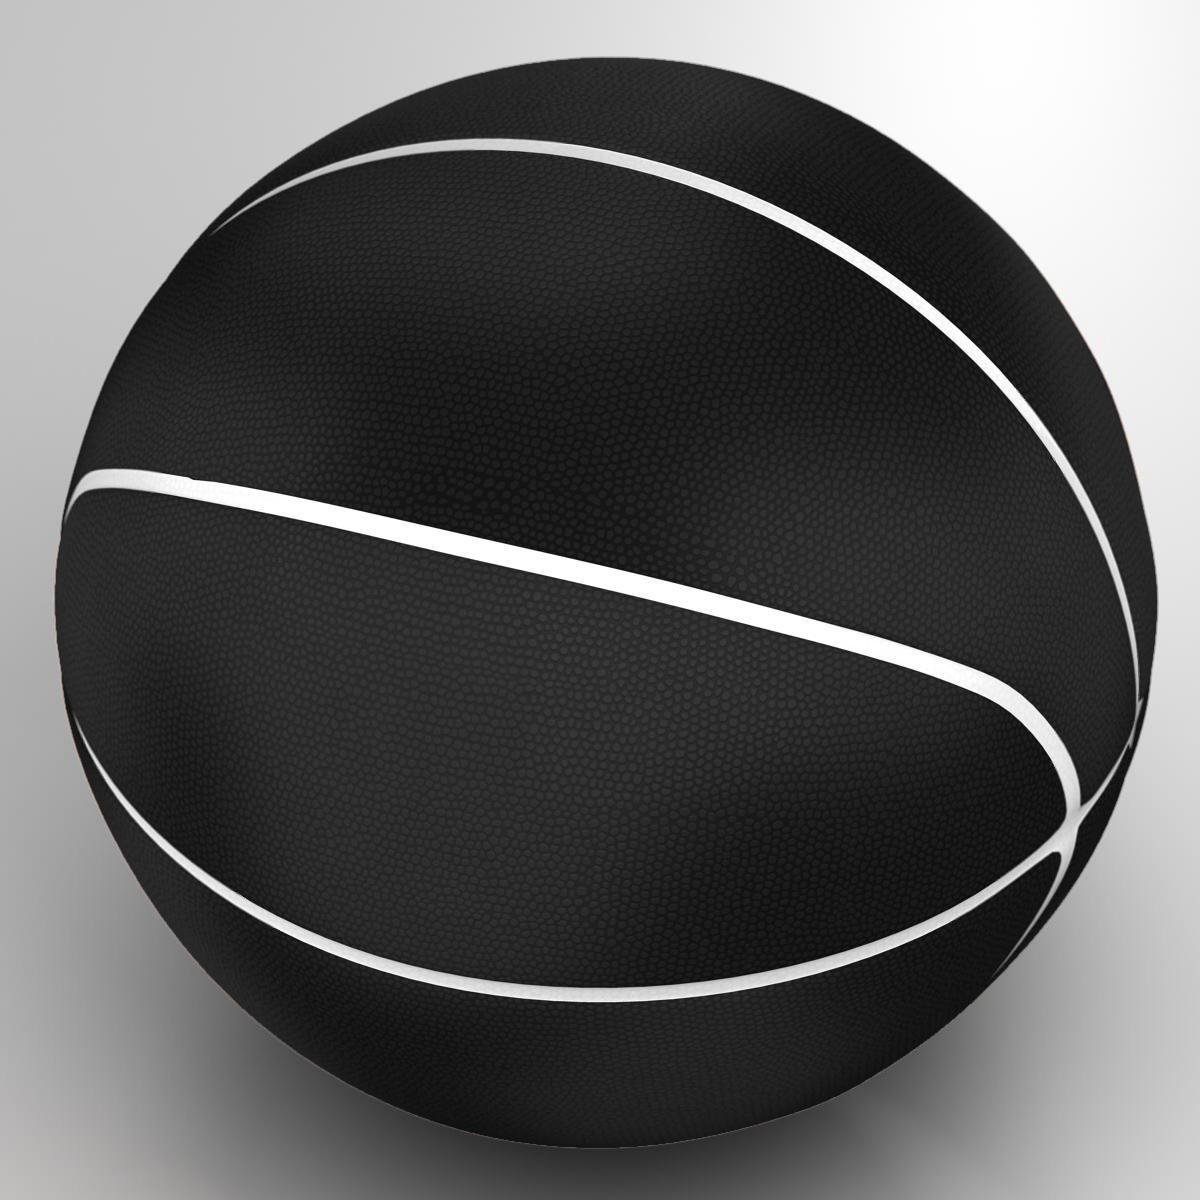 black basketball ball 3d model 3ds max fbx c4d ma mb obj 164932